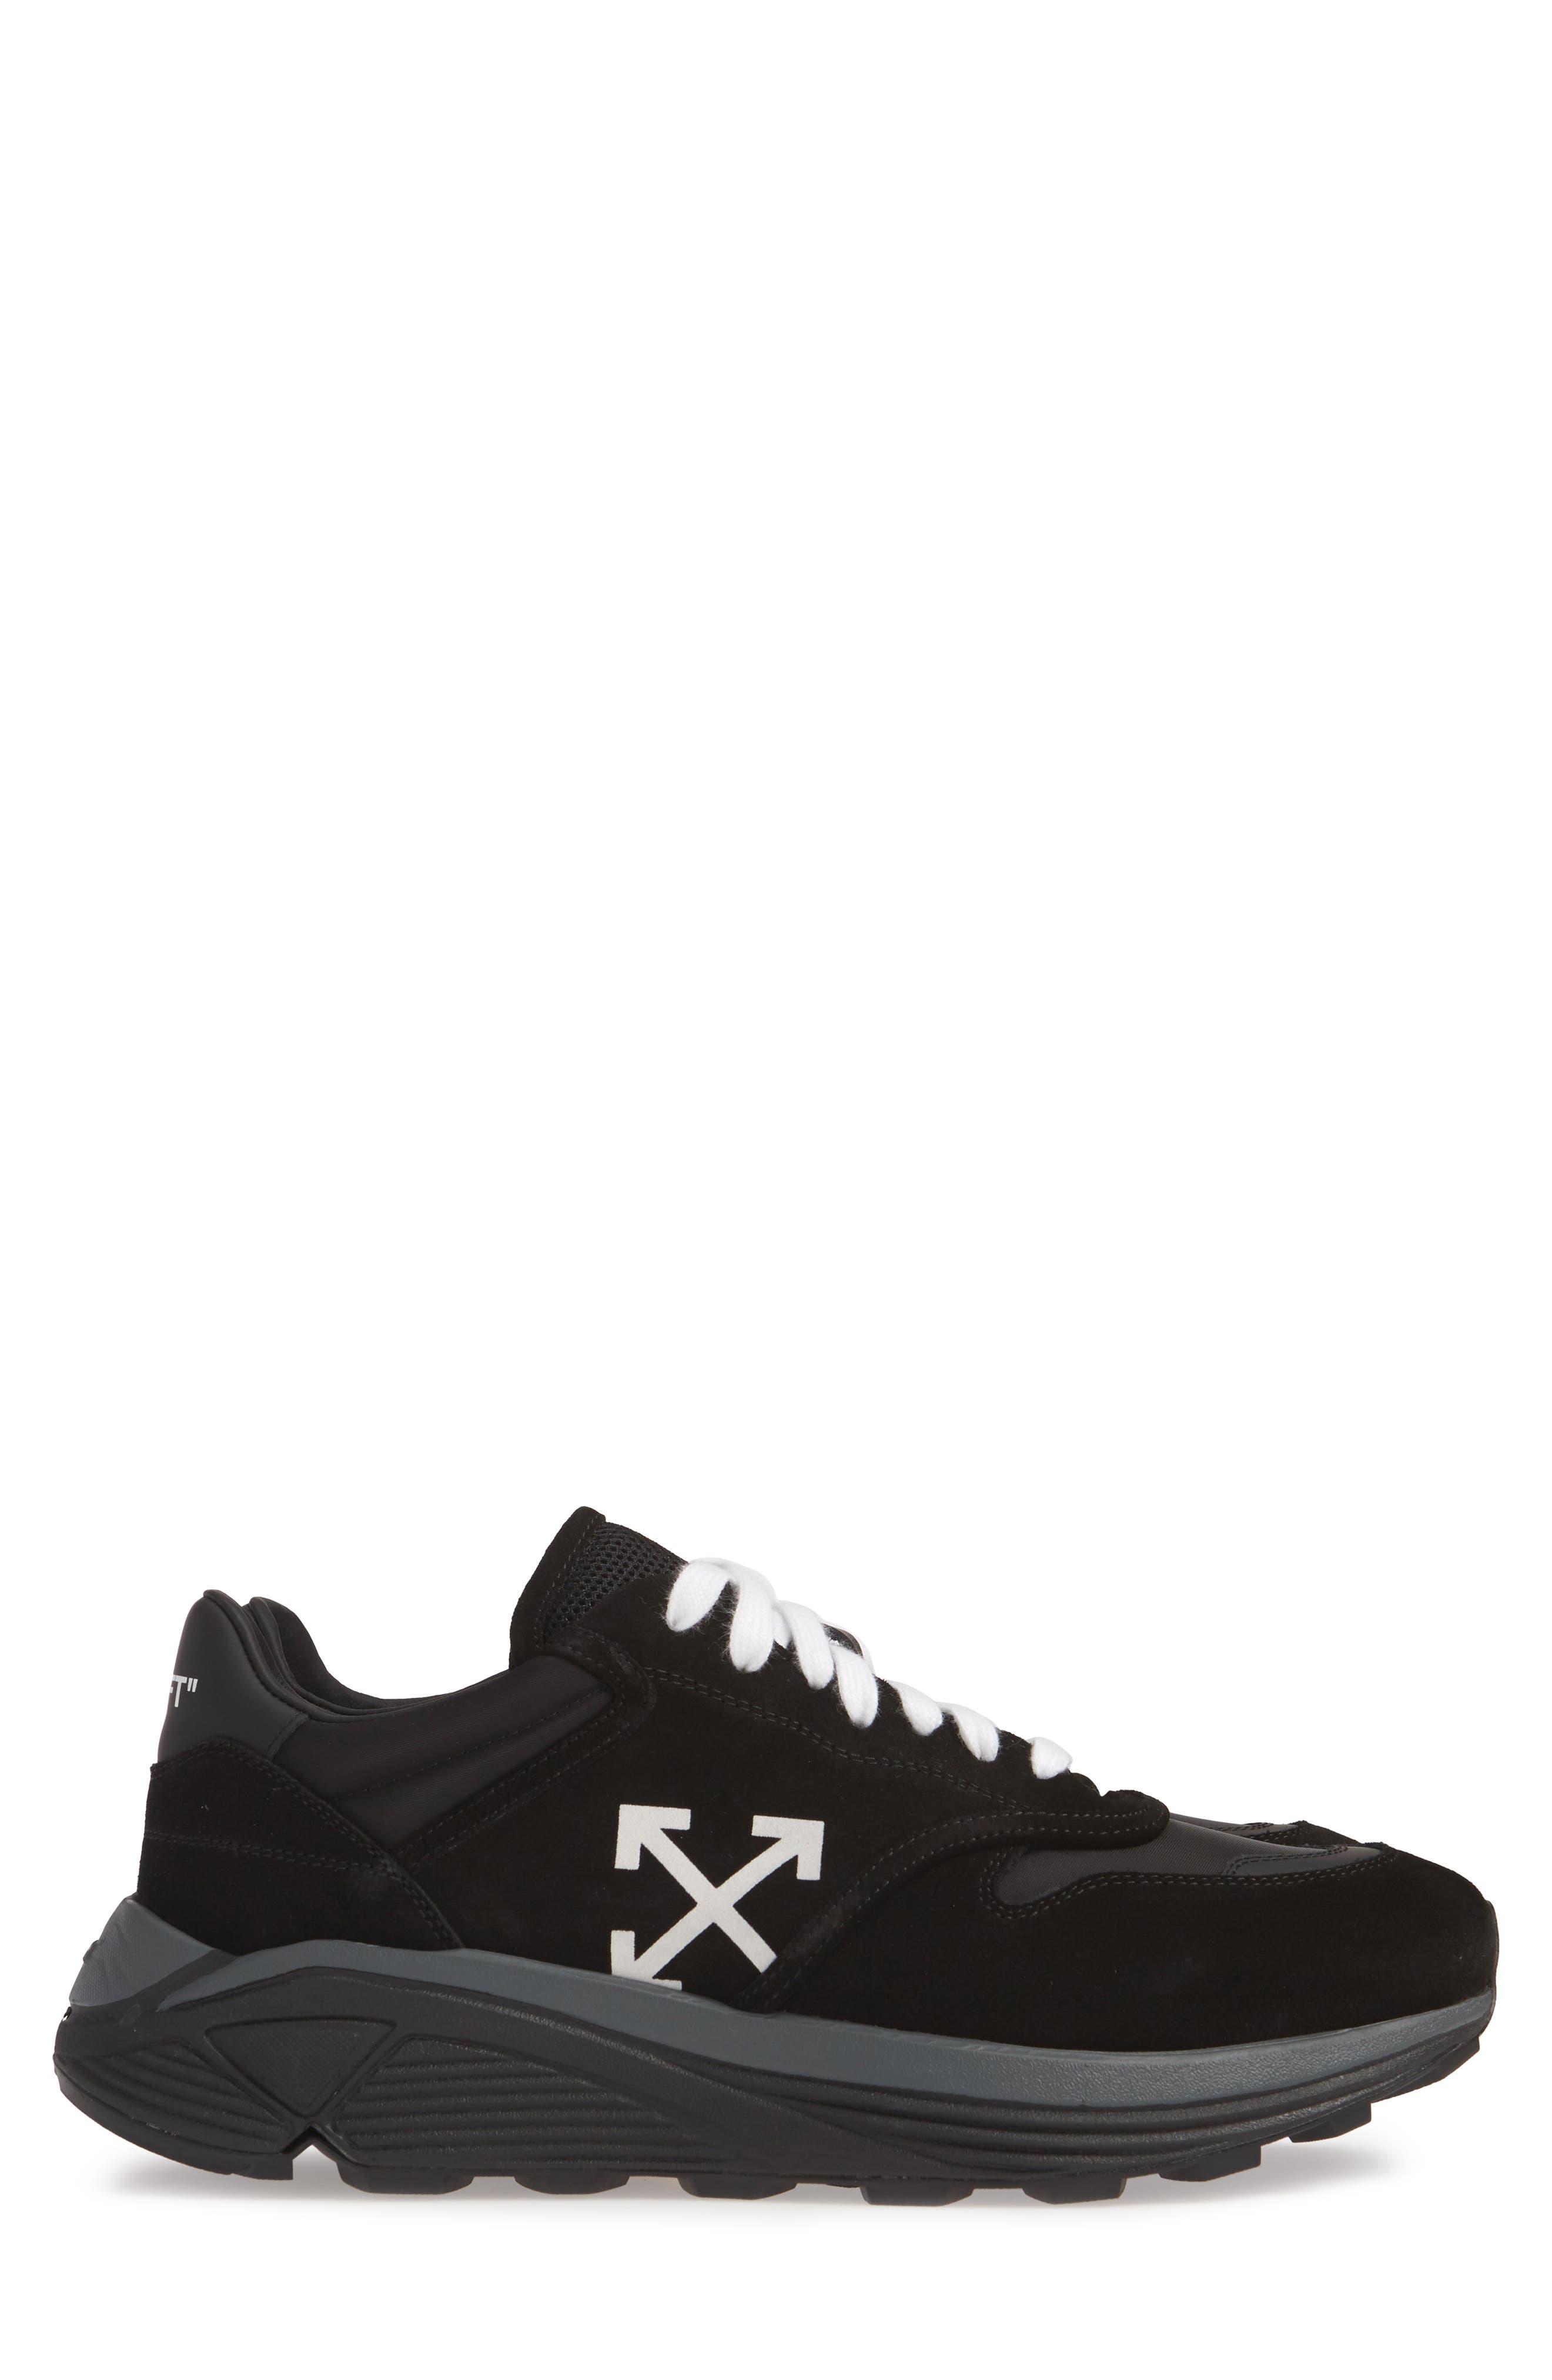 Jogger Sneaker,                             Alternate thumbnail 4, color,                             BLACK/ WHITE